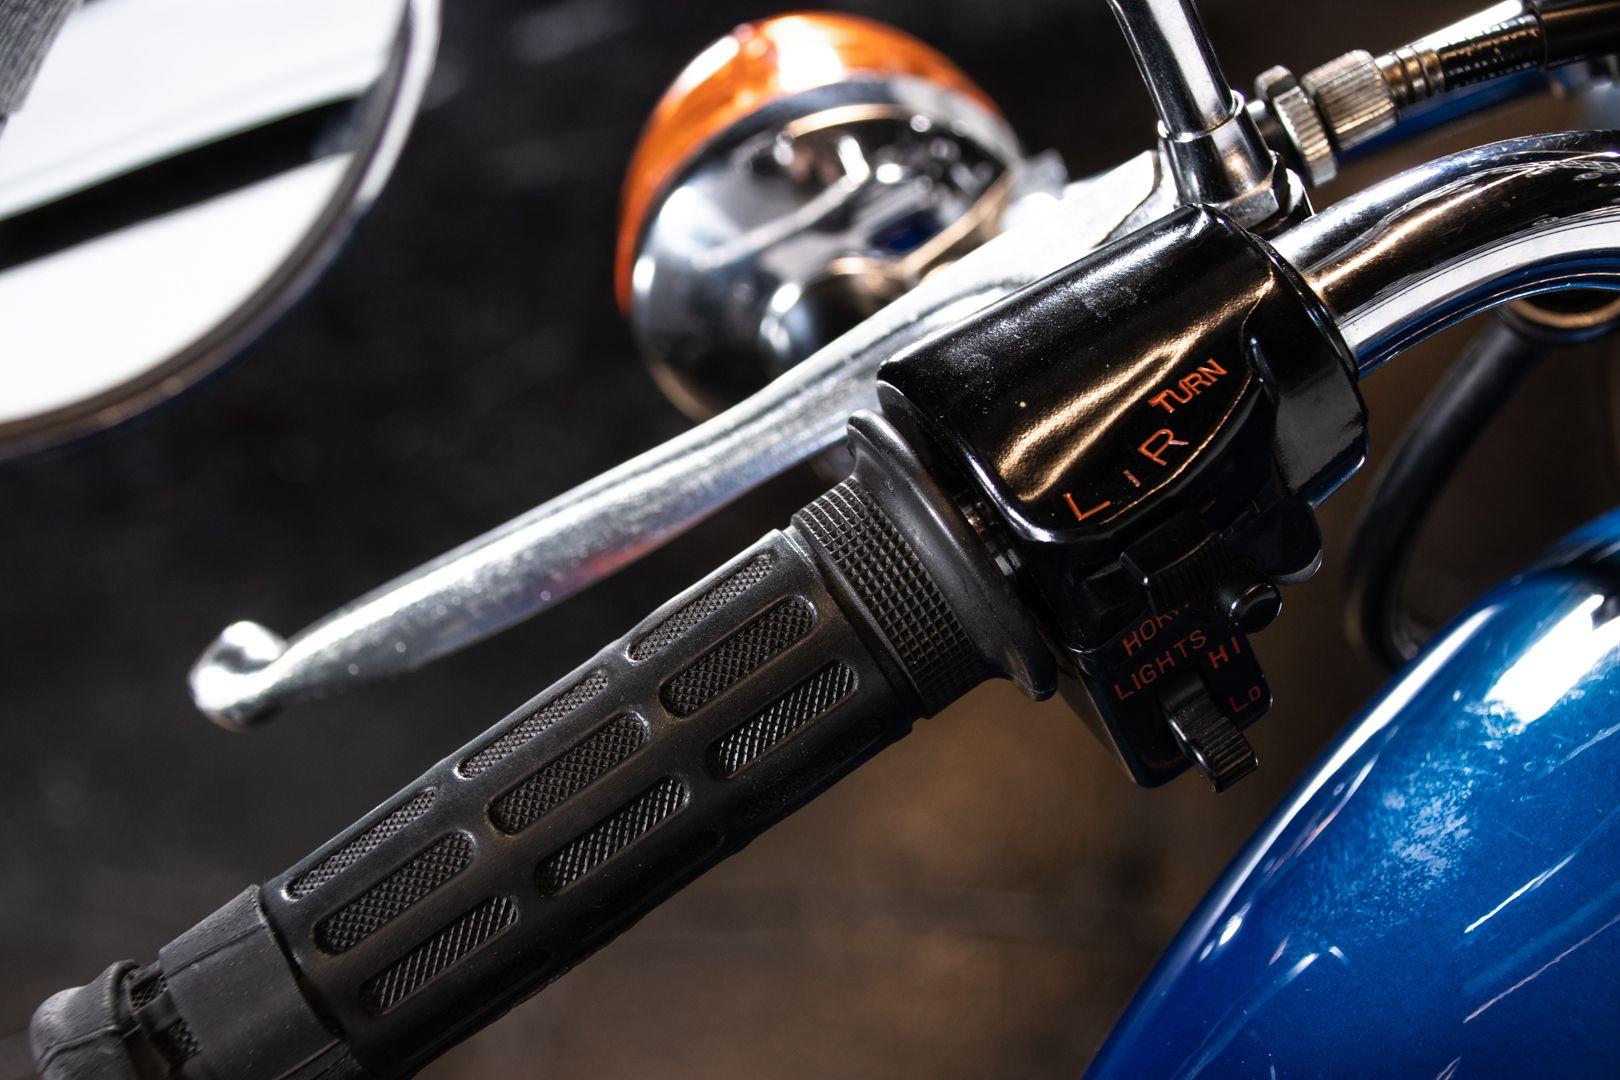 1980 Honda CB 125 7/C 63465